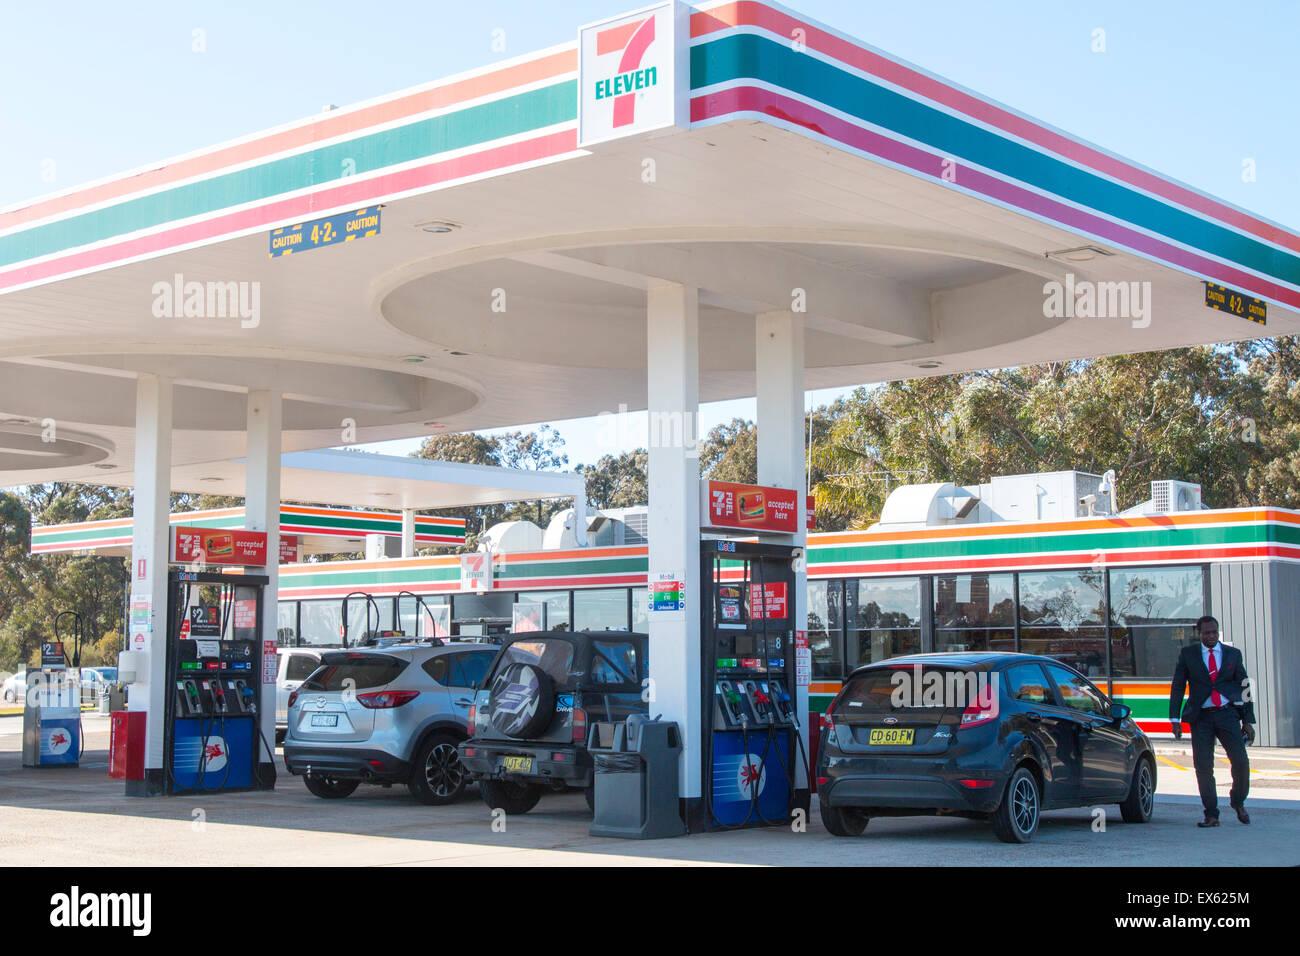 7 Eleven Branded Petrol Station At Pheasants Nest Service